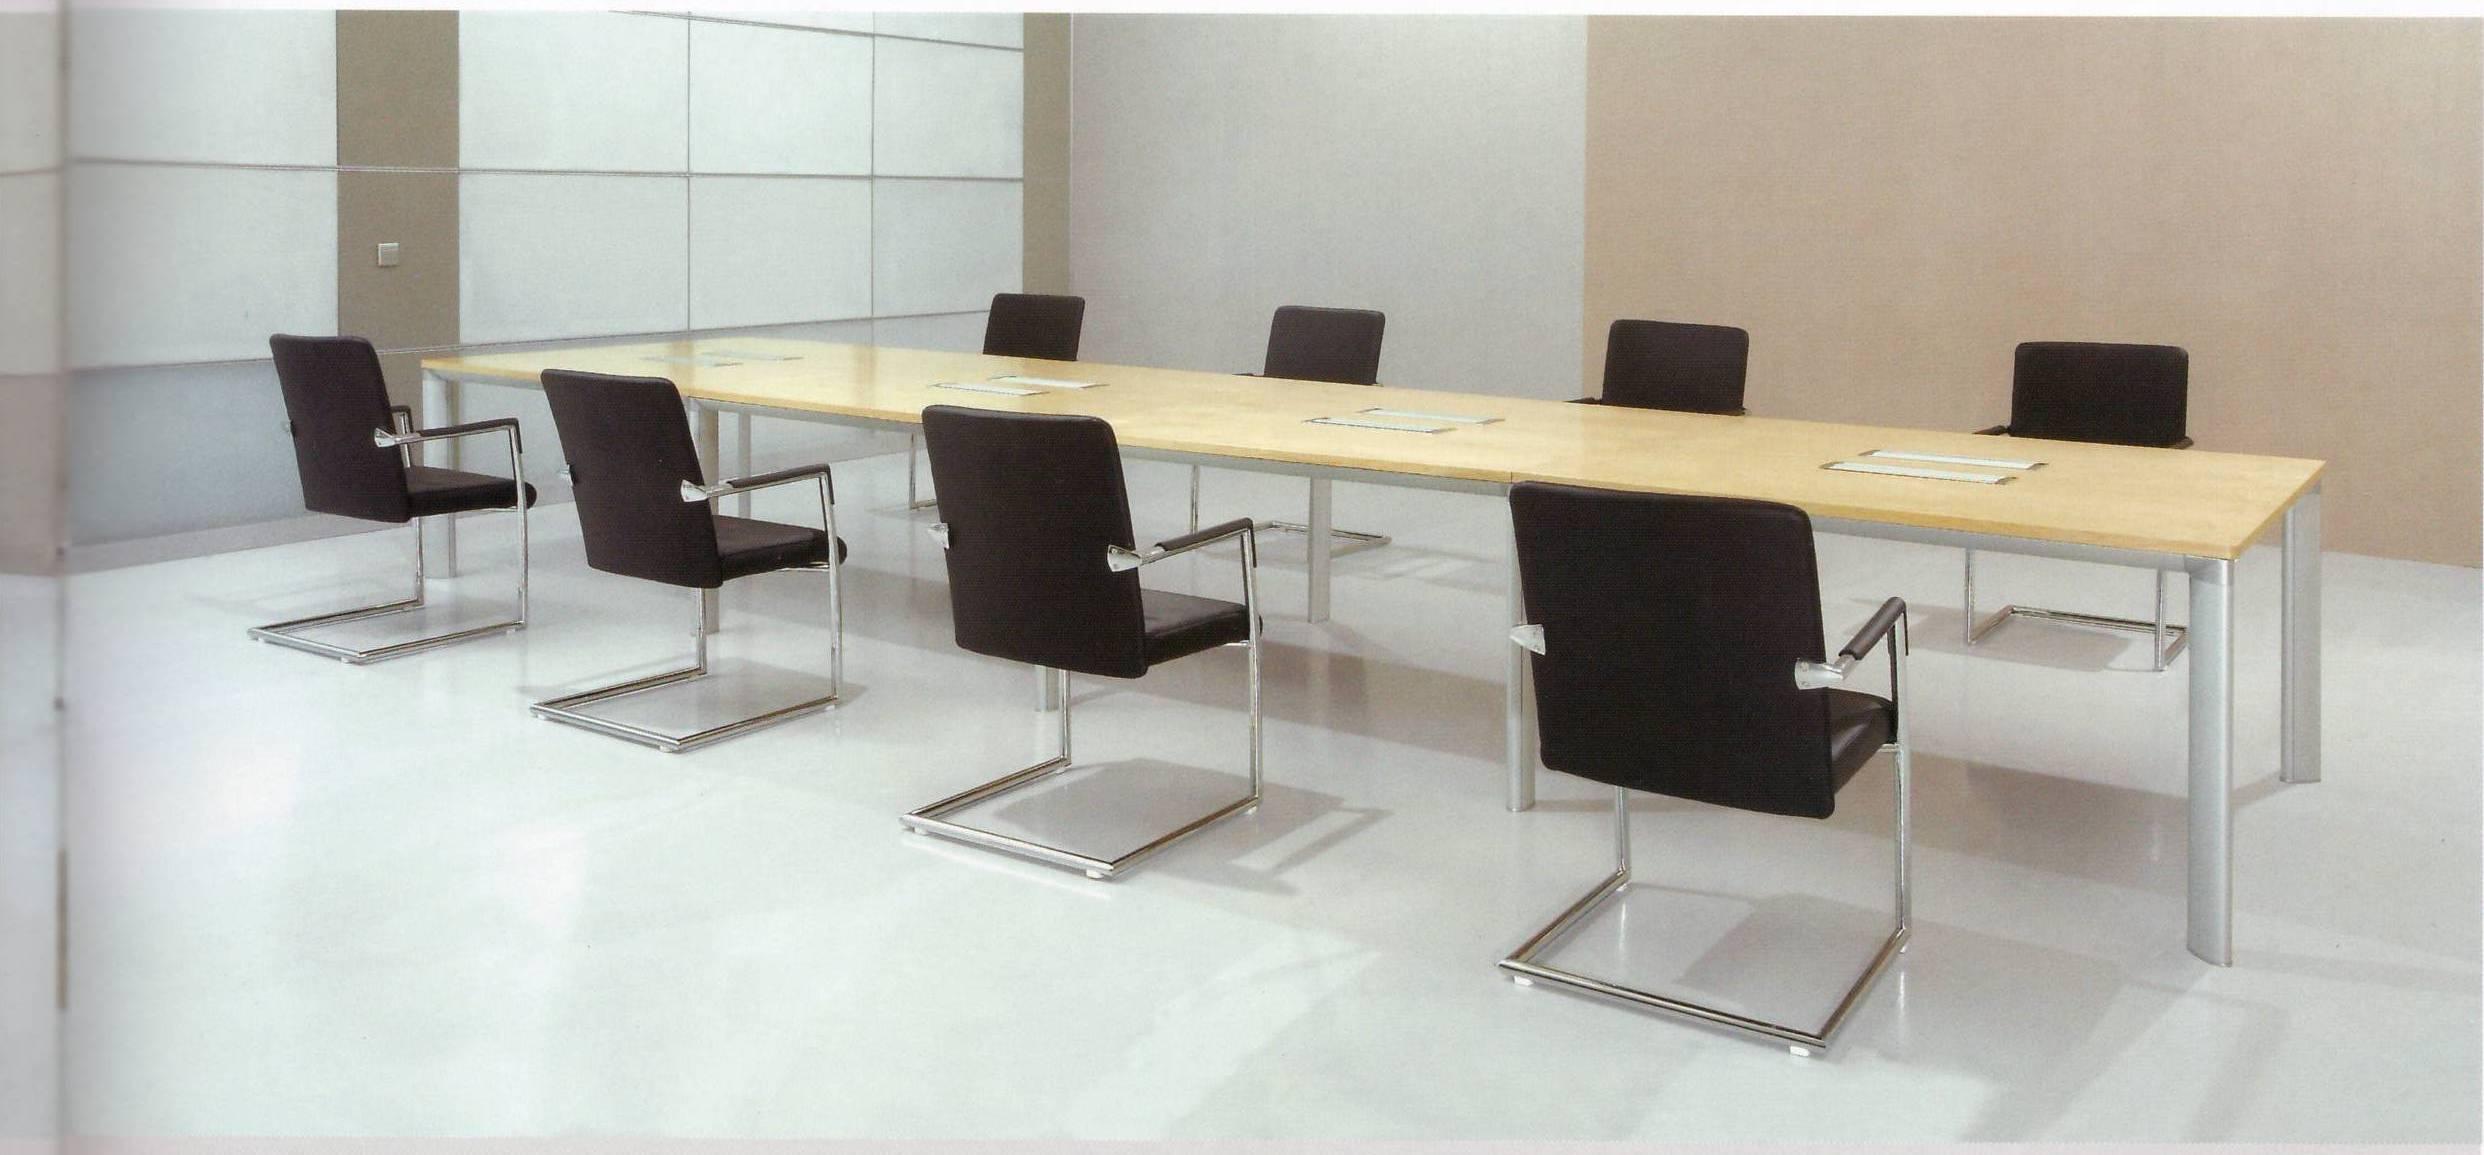 现代会议桌FY11015